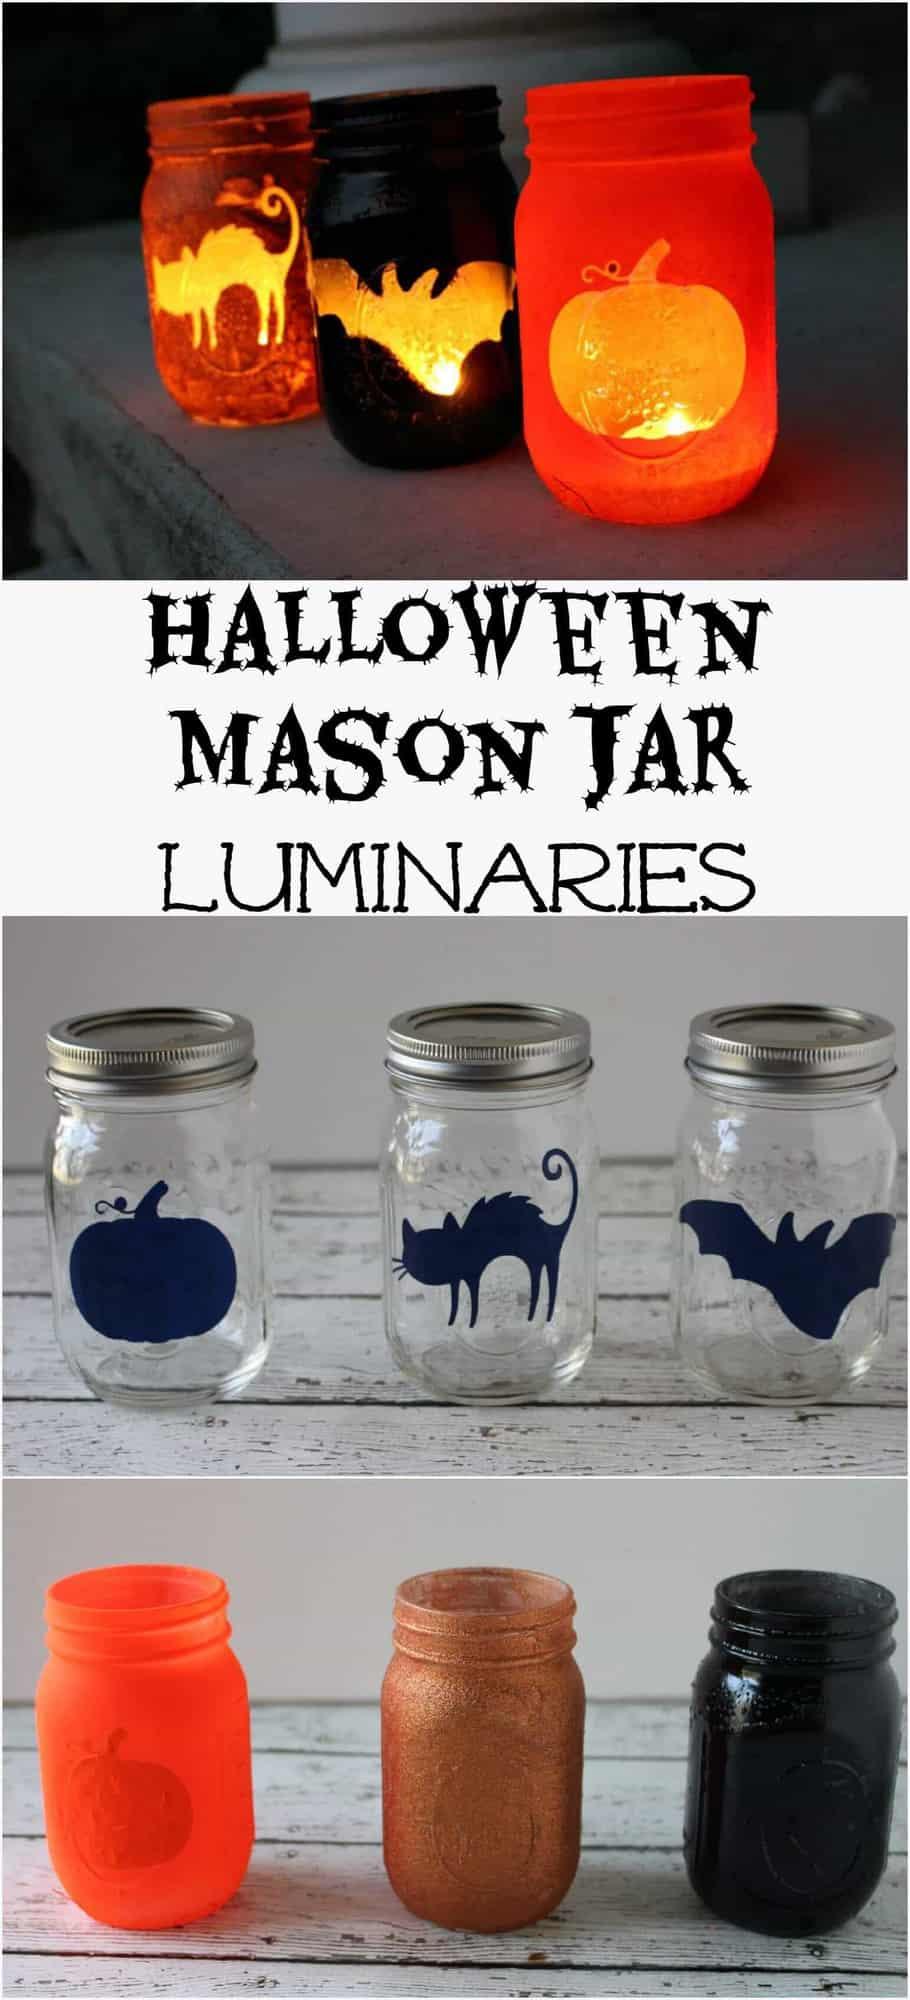 halloween mason jar luminaries - princess pinky girl